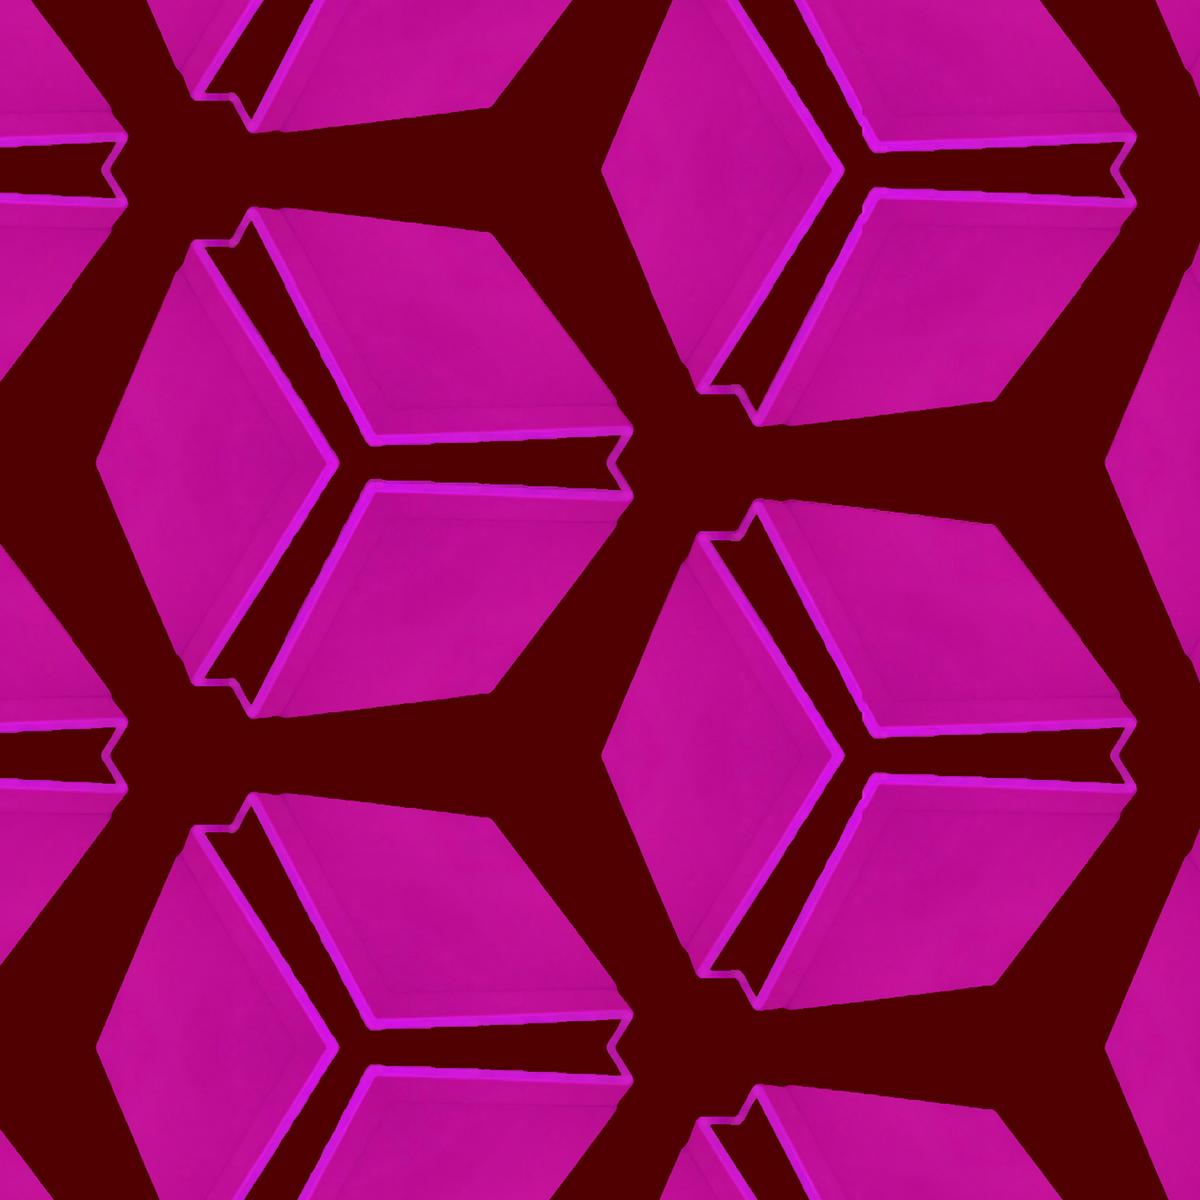 Cubed Rasberry